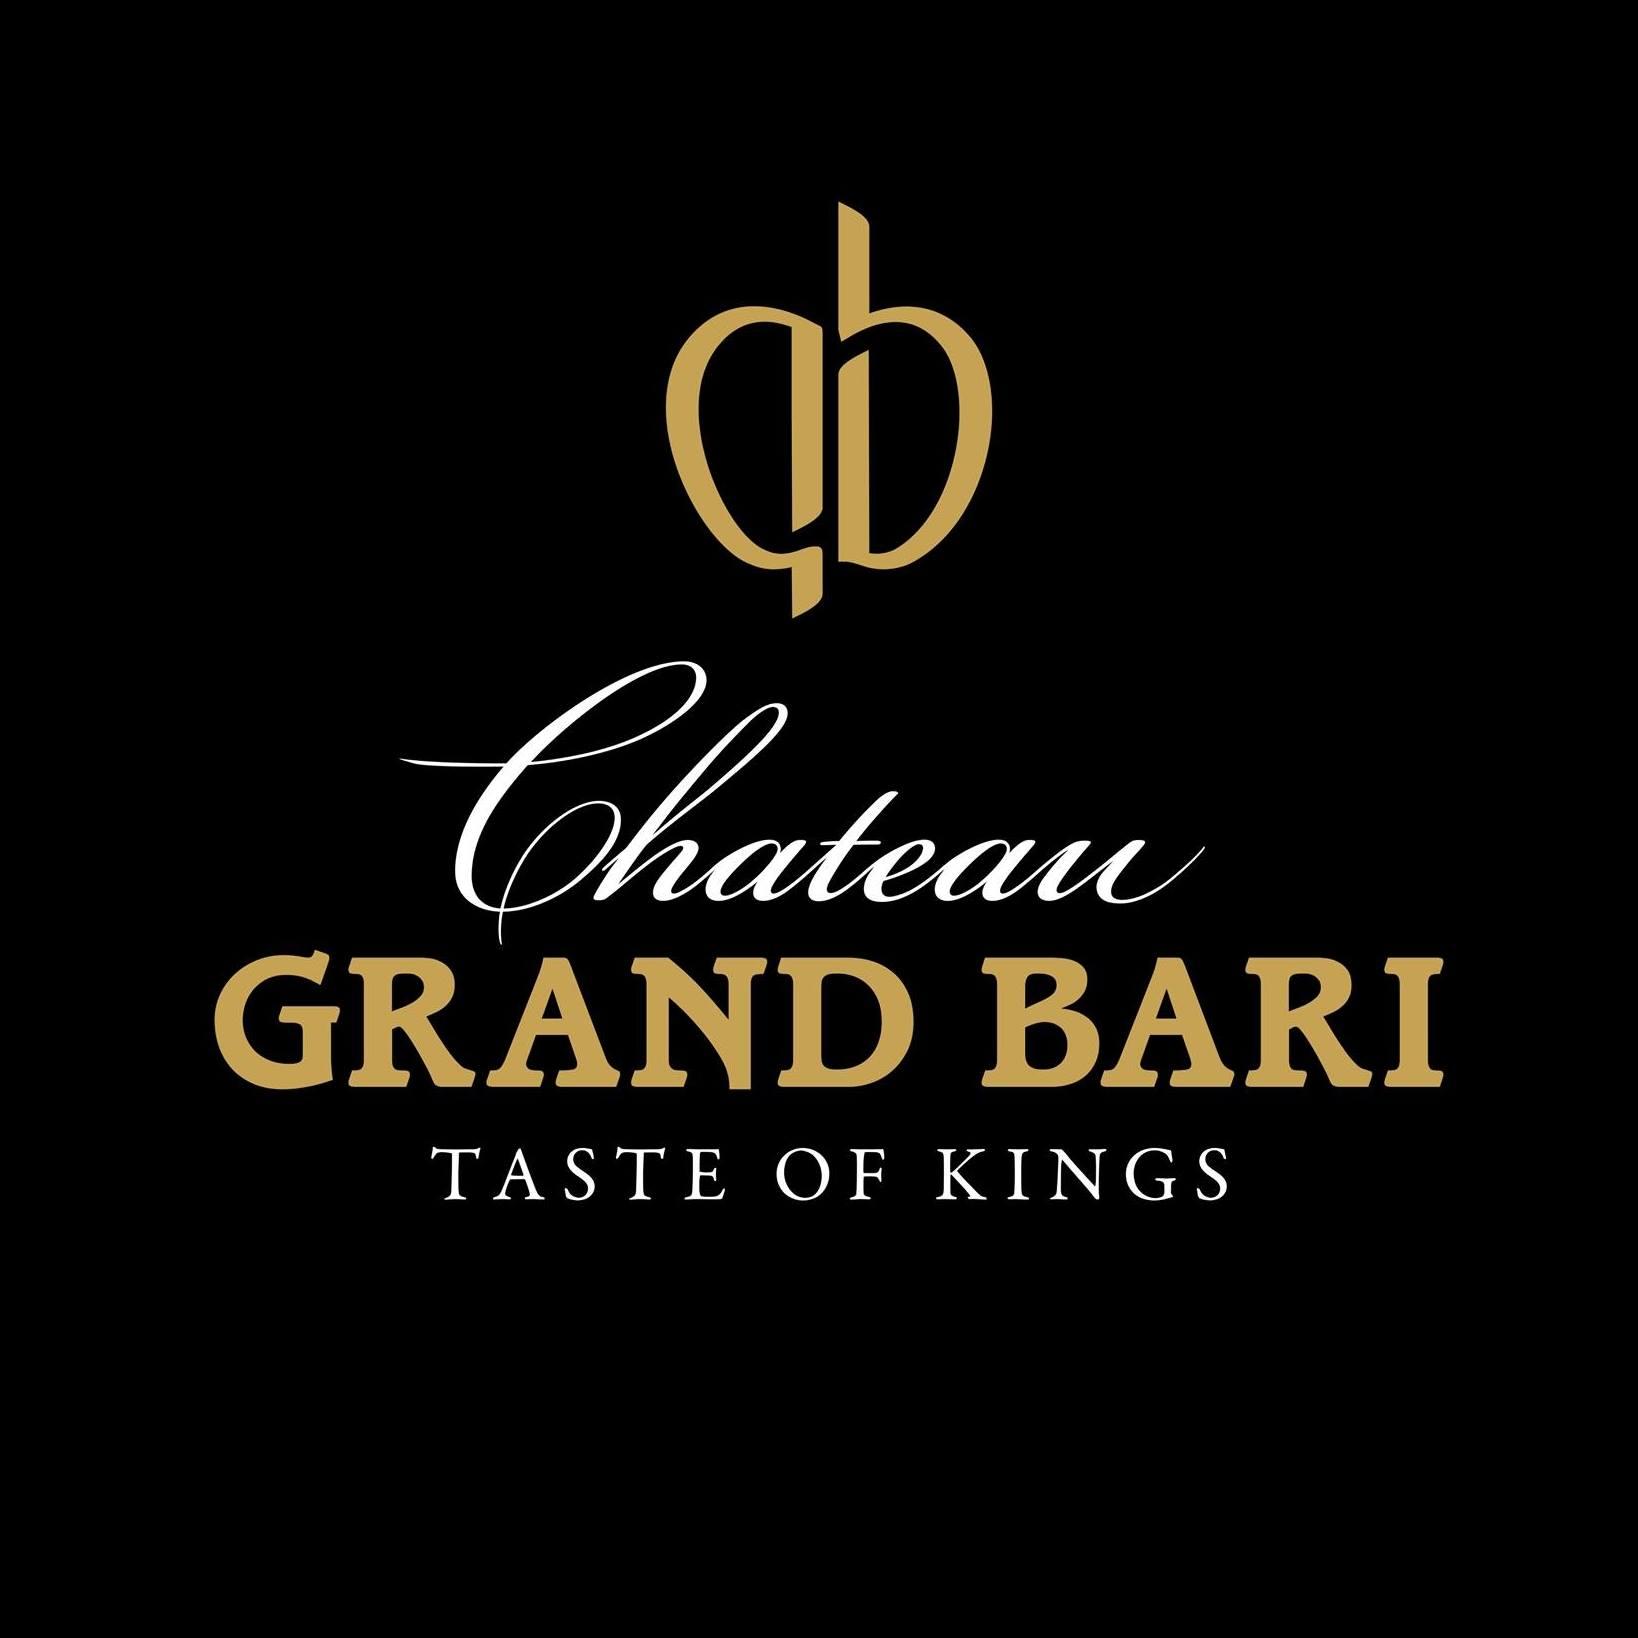 Chateau GRAND BARI